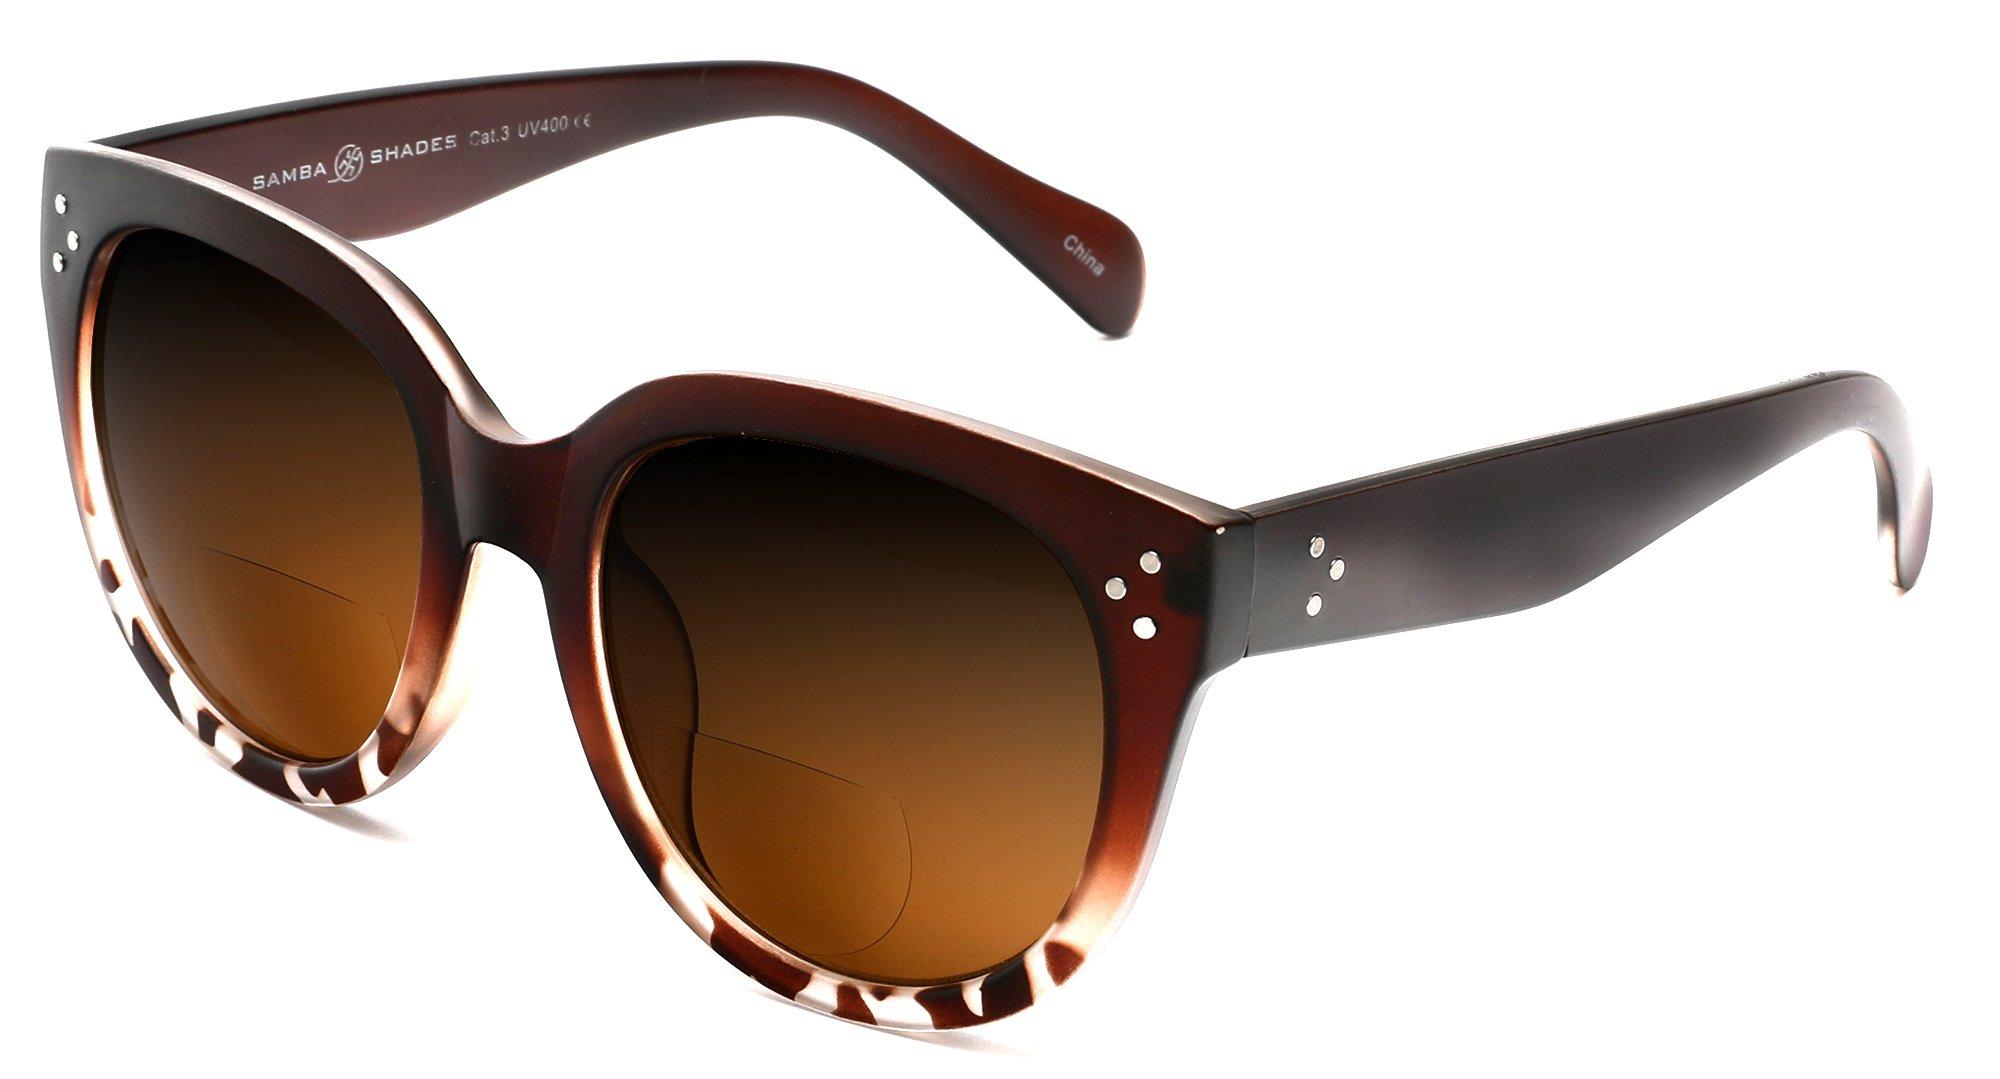 Samba Shades Bi-Focal Sun Readers Oversized Round Audrey Hepburn Sunglasses Matte Dark Brown 2.50 Power